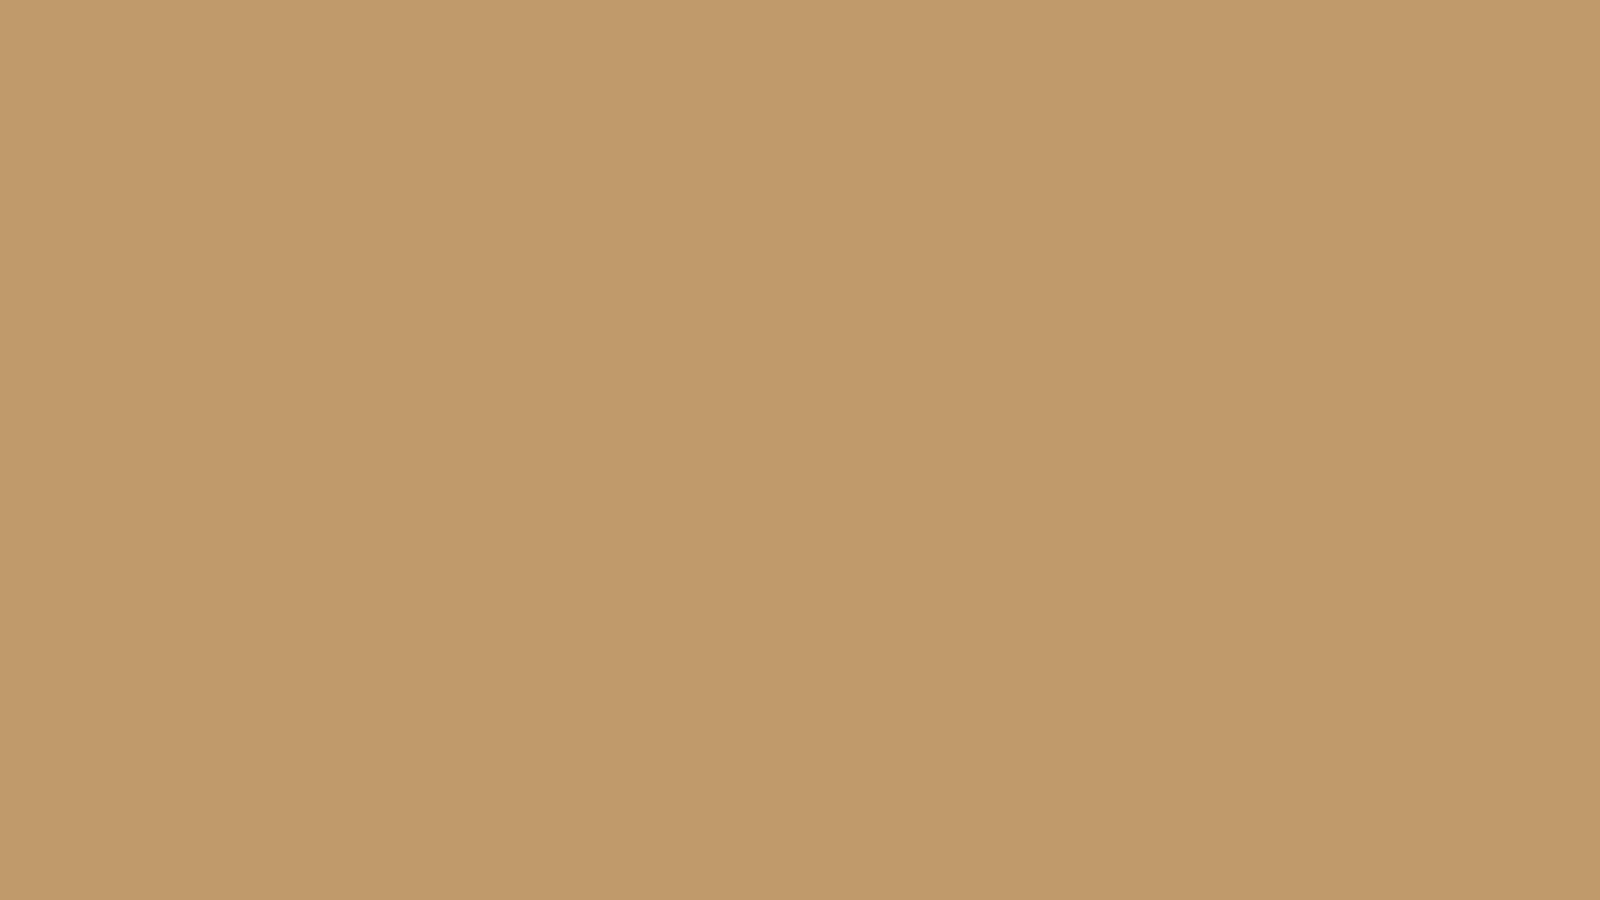 1600x900 Lion Solid Color Background